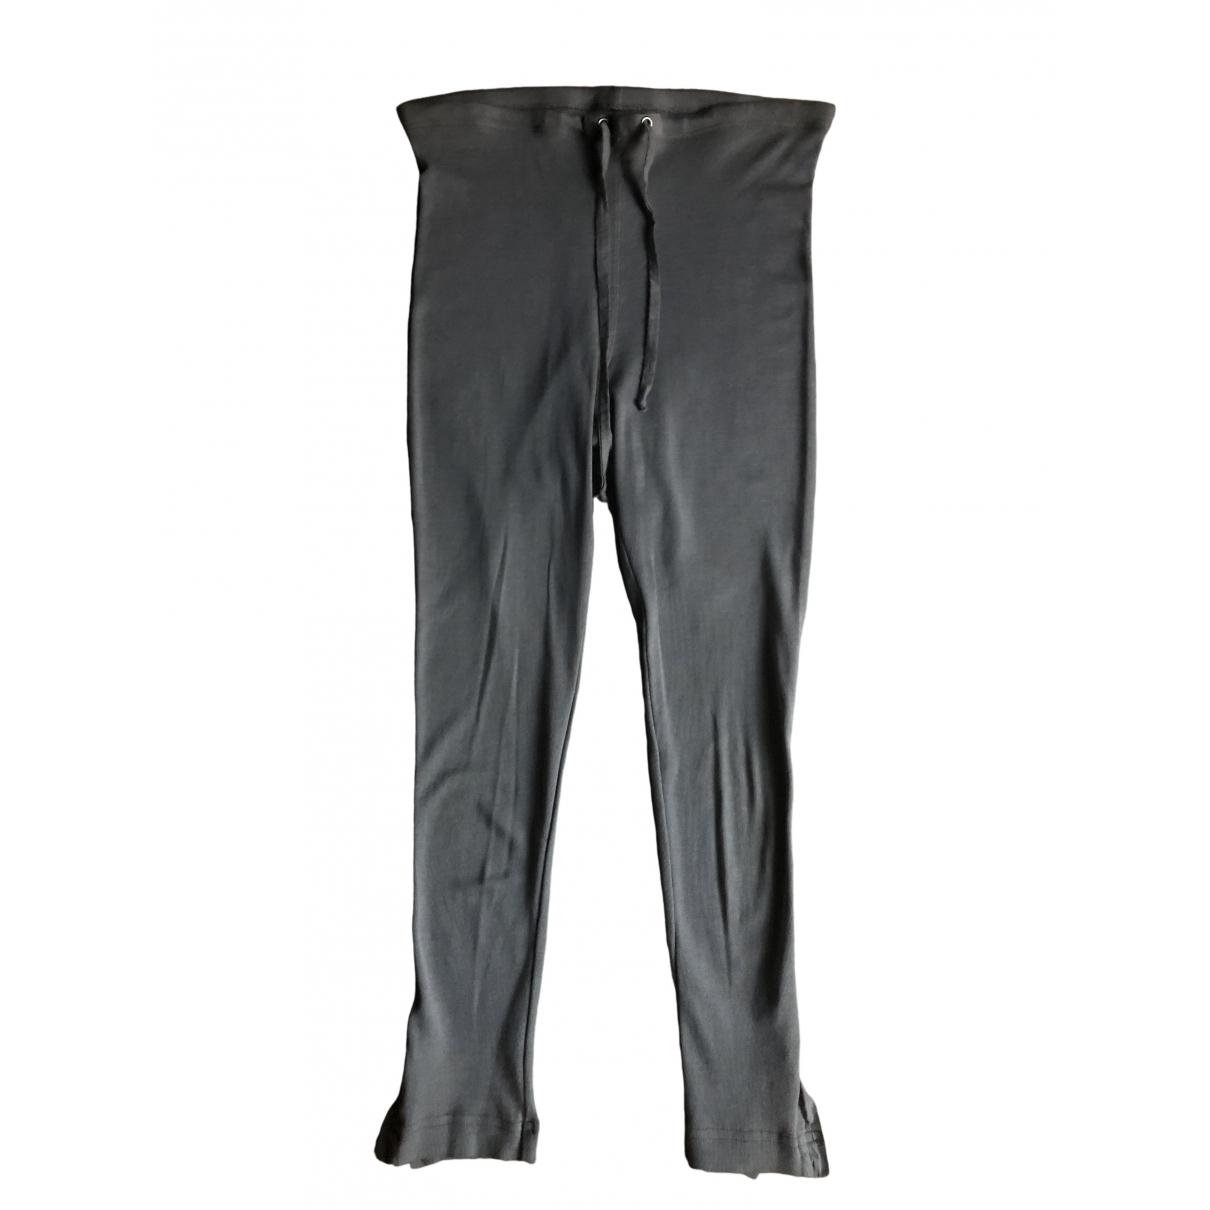 Kristensen Du Nord \N Grey Cotton Trousers for Women M International